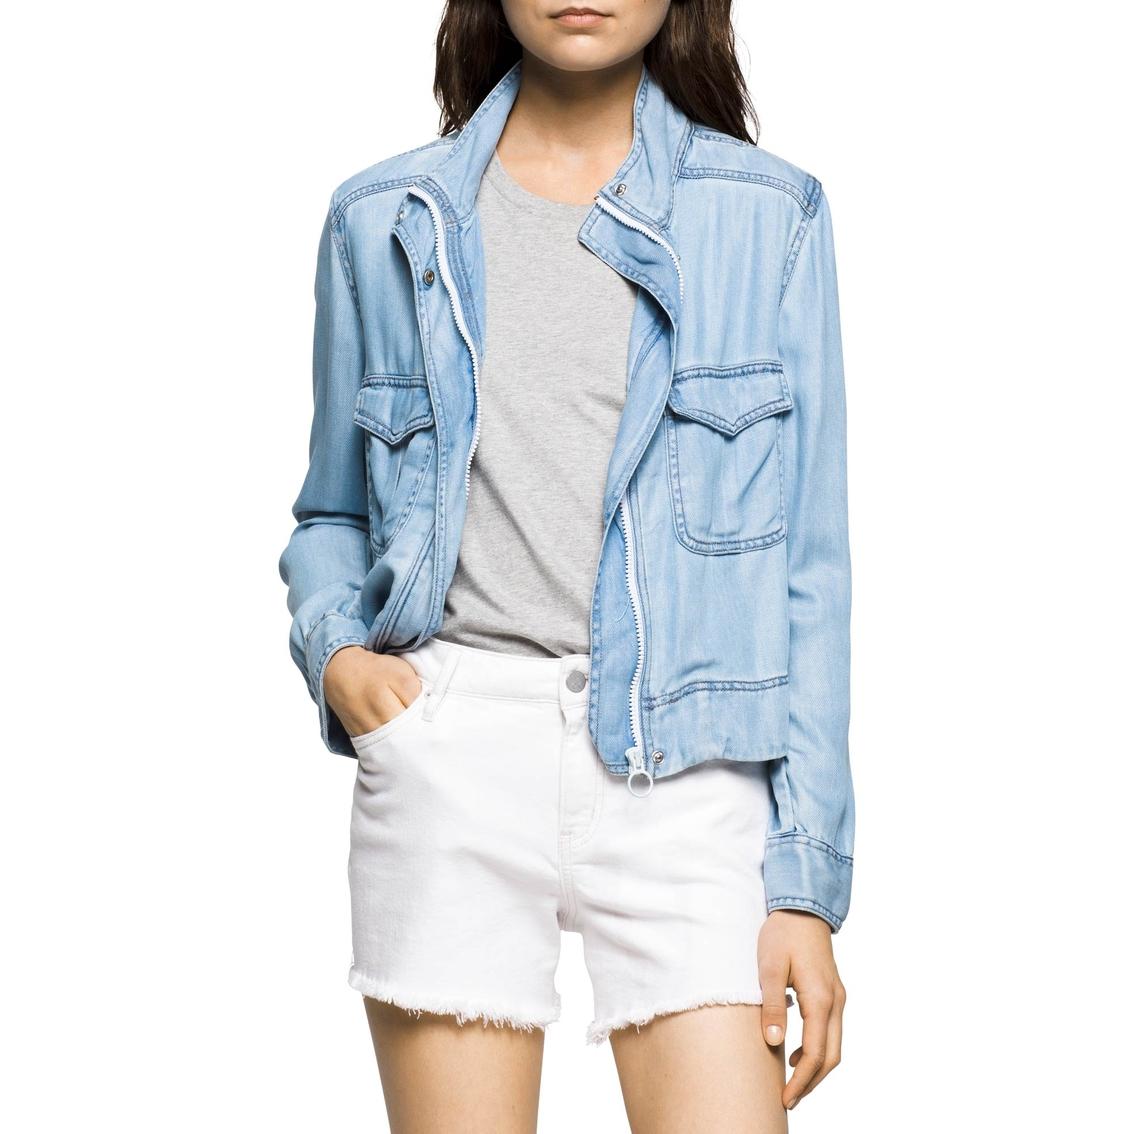 64994c86ebe5 Calvin Klein Jeans Utility Jacket | Jackets | Apparel | Shop The ...